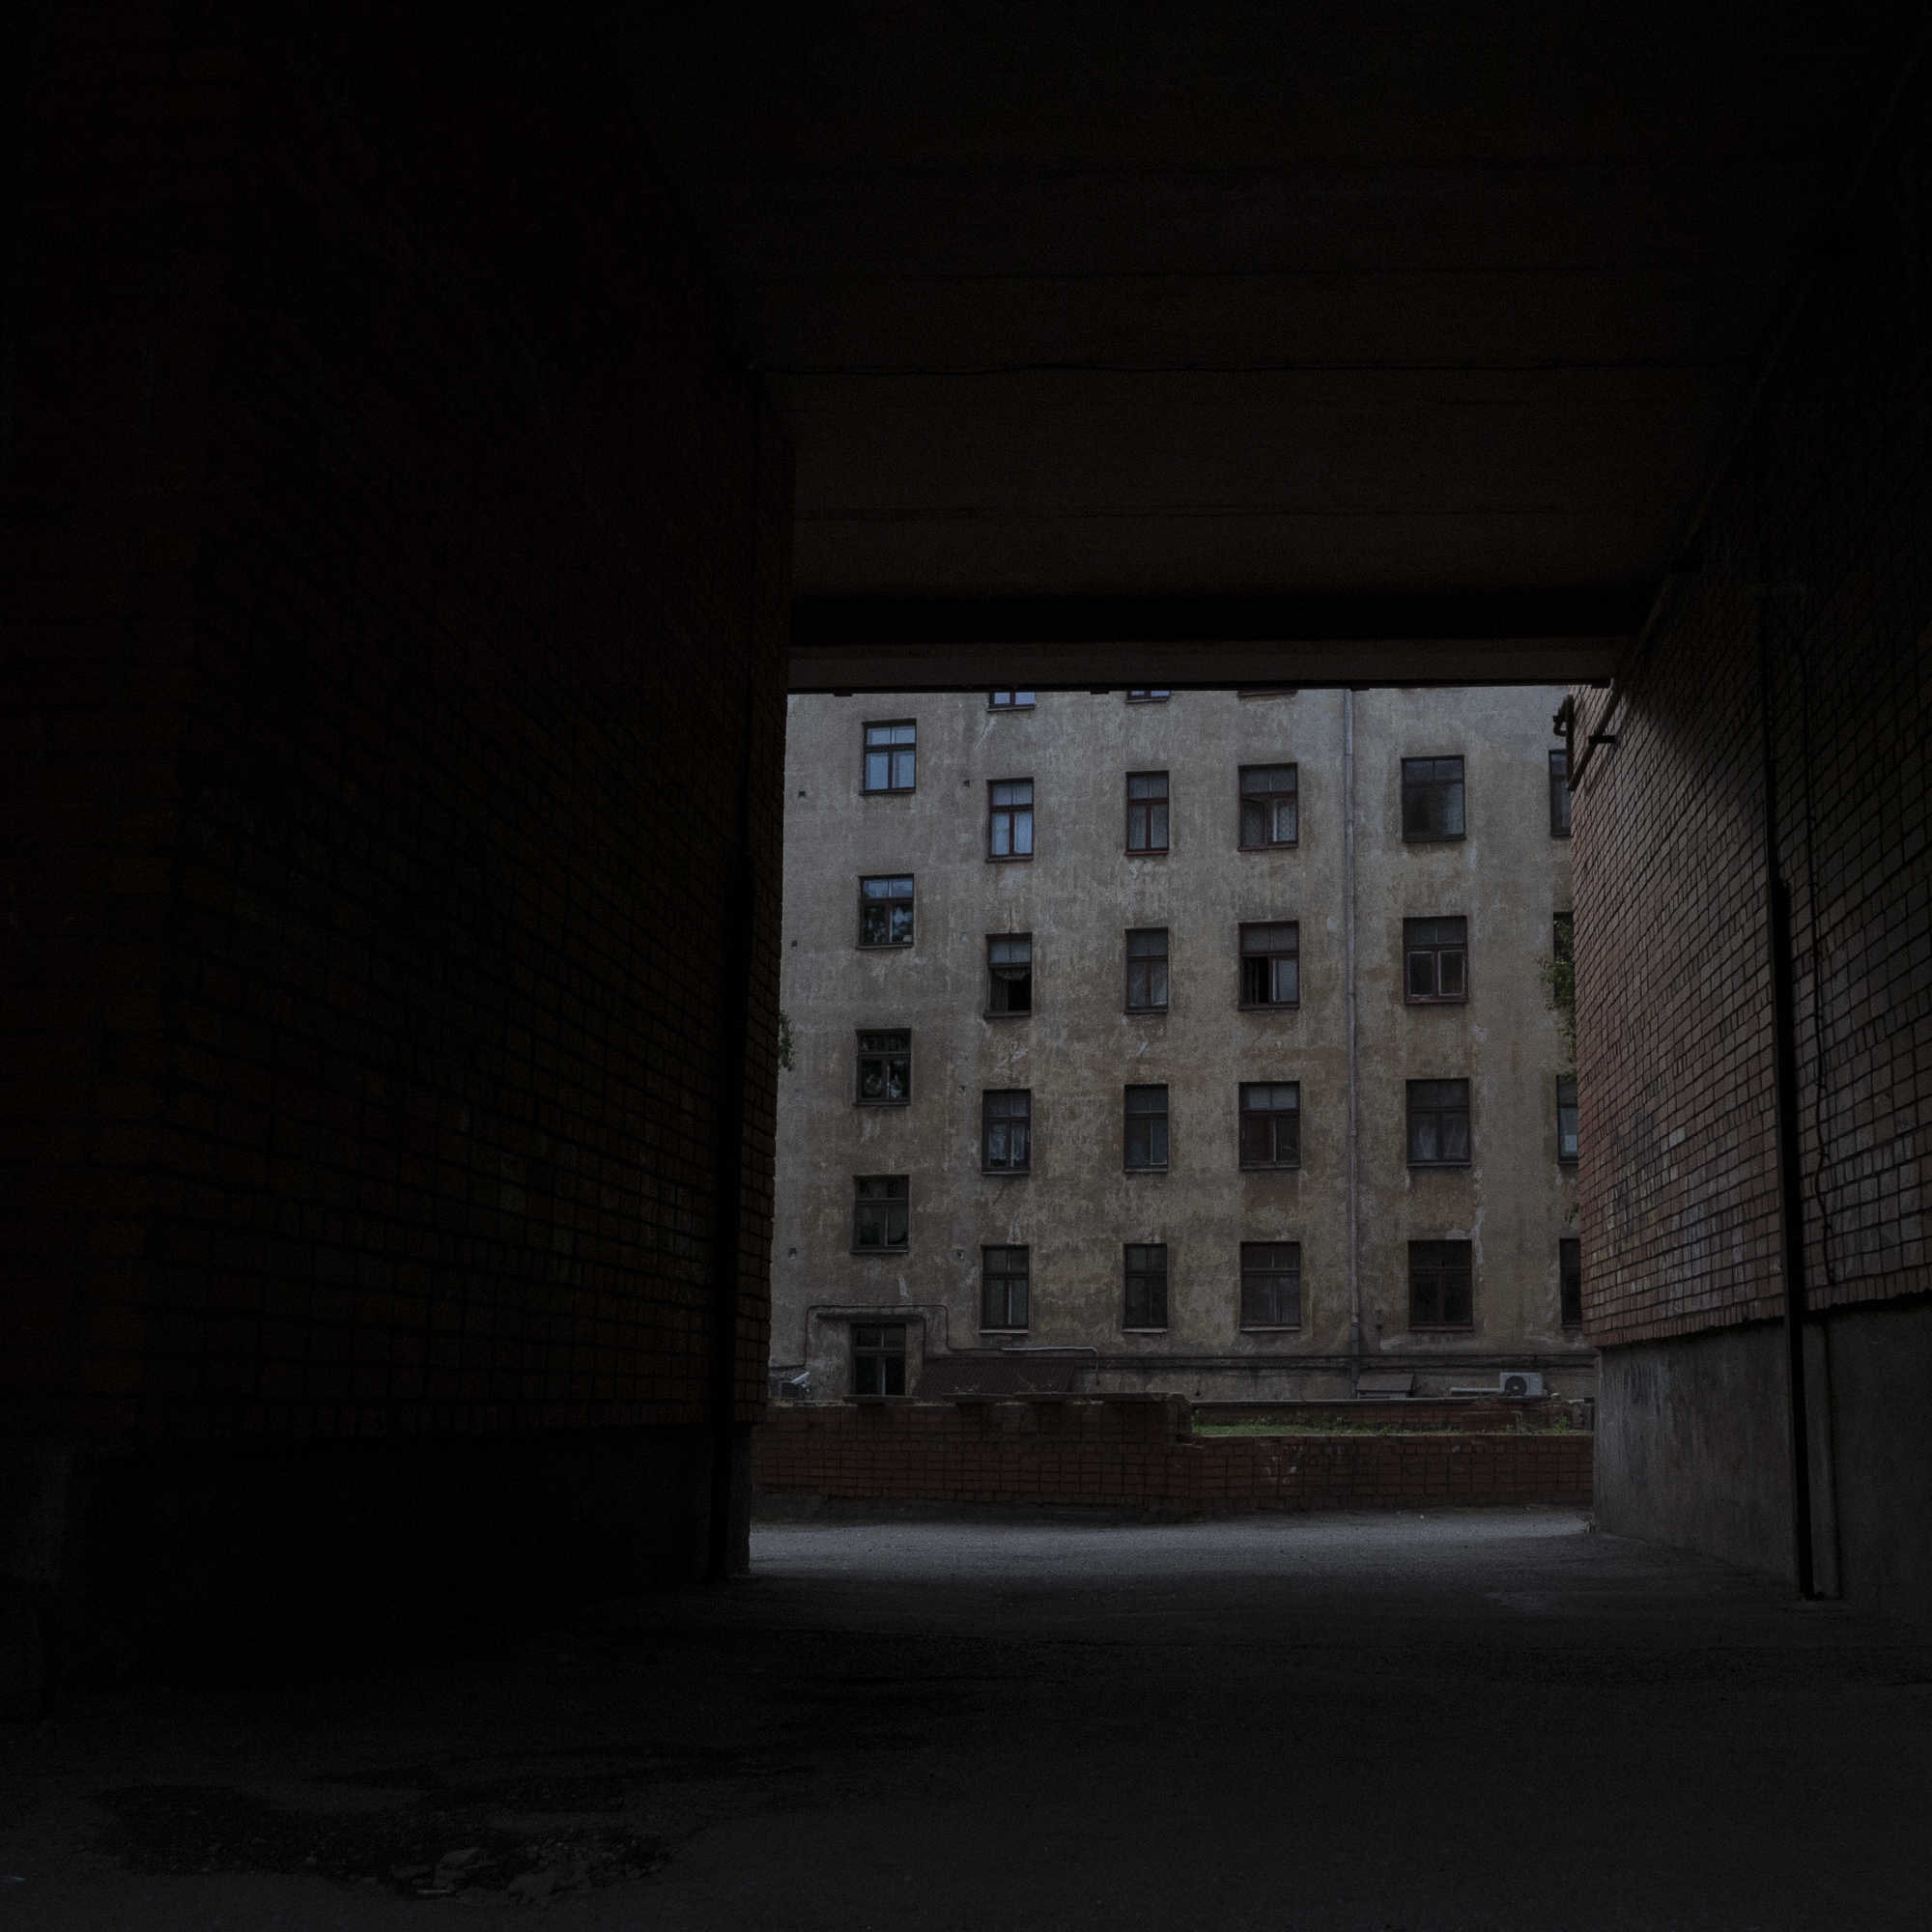 09.black.street.siluett.04.jpg